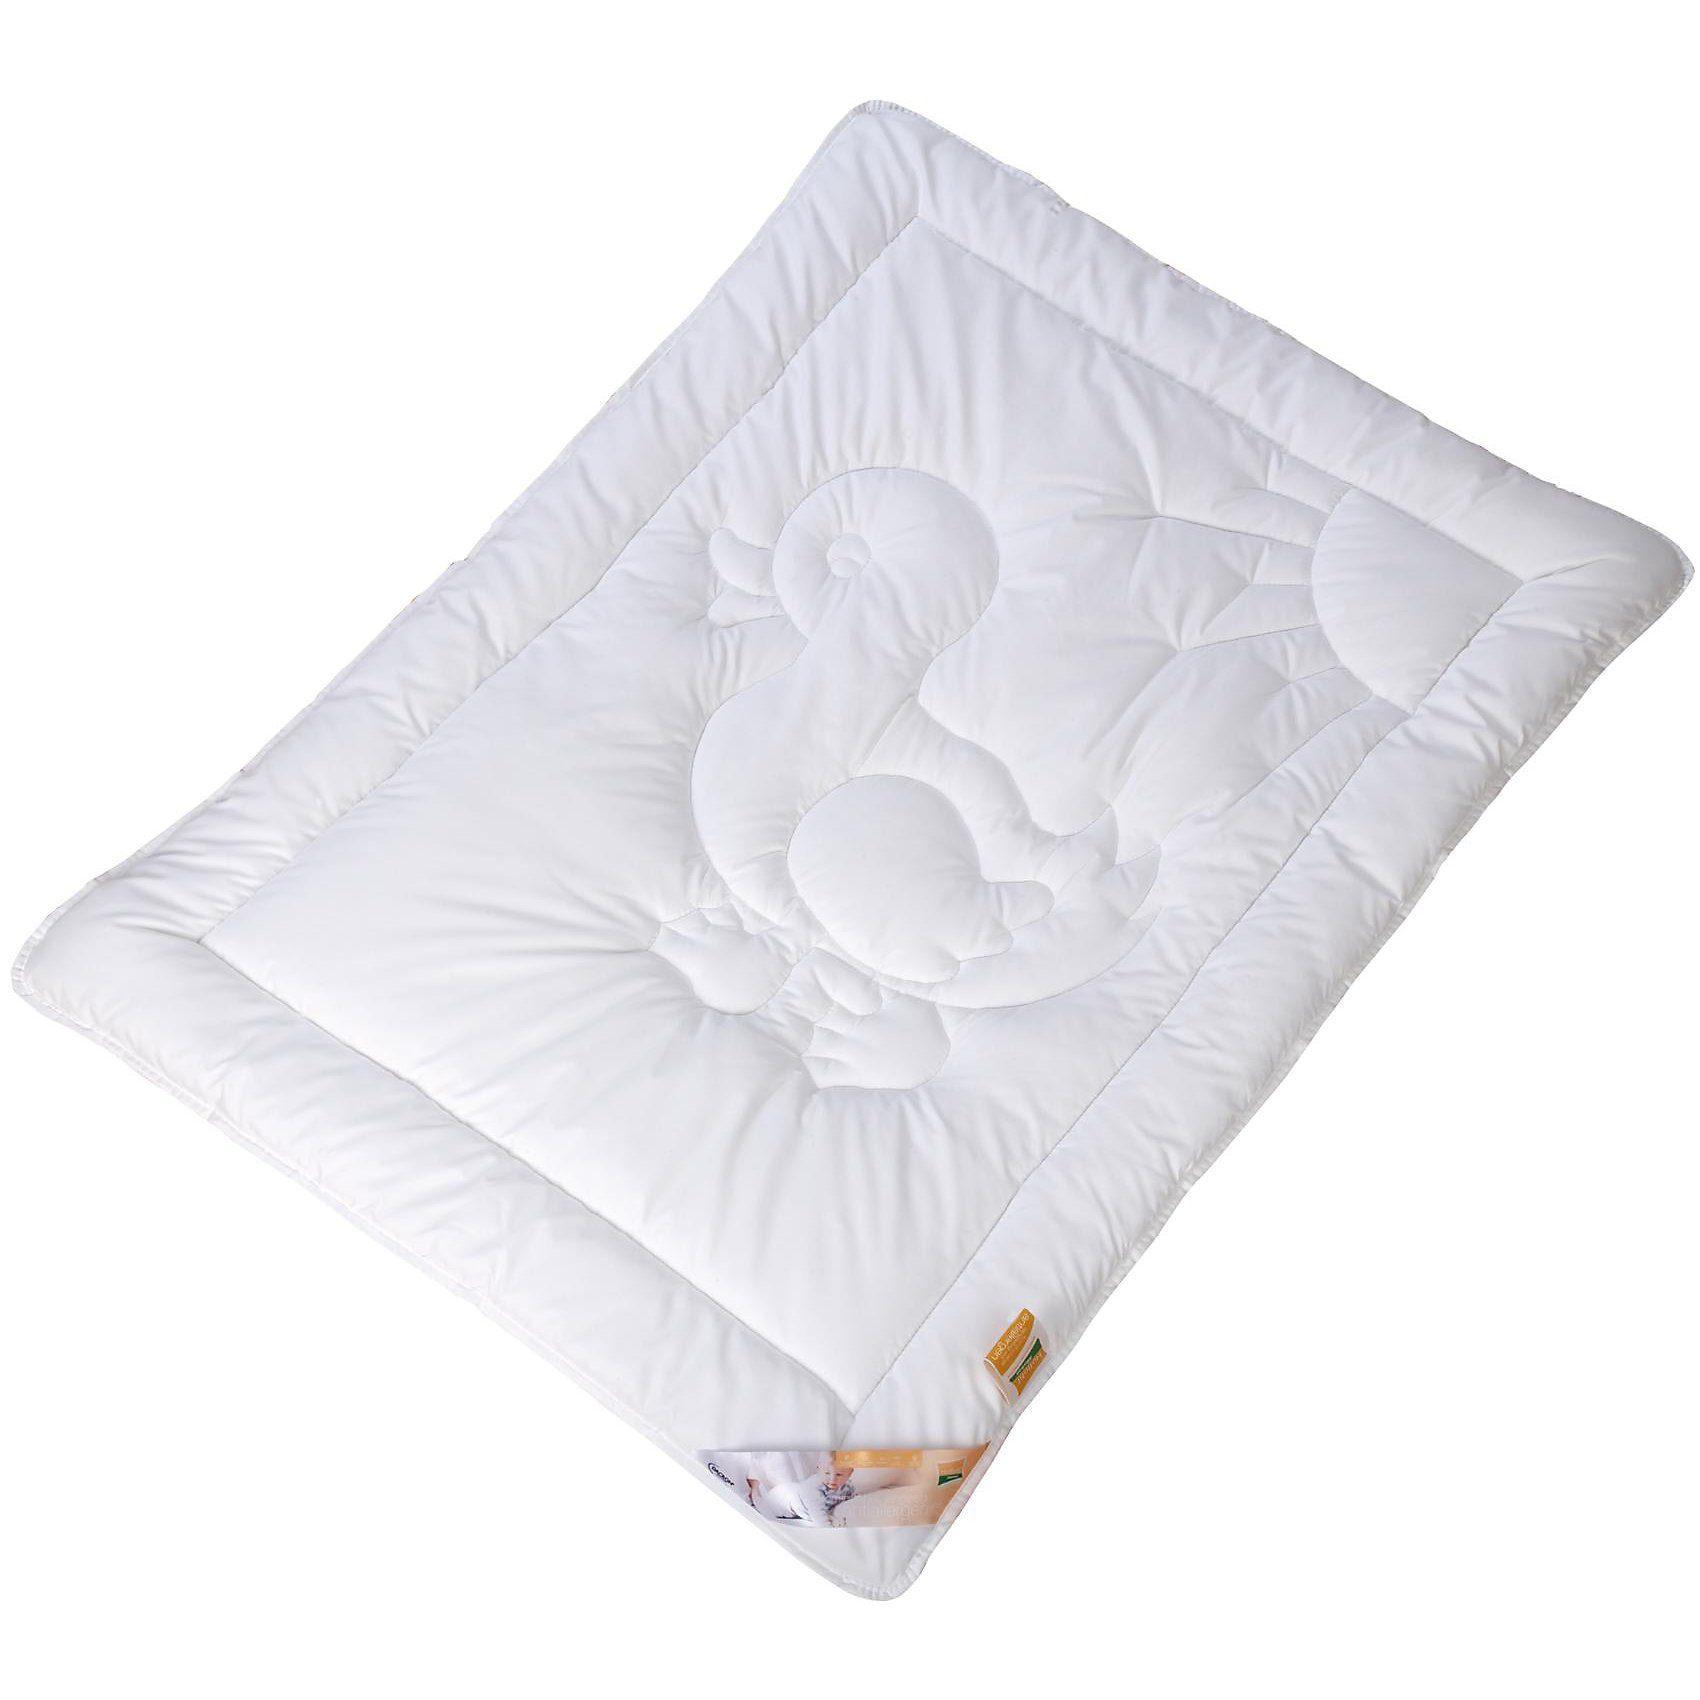 Alvi Kinder Bettdecke Hollofill Allerban, Kunstfaser, antiallerge